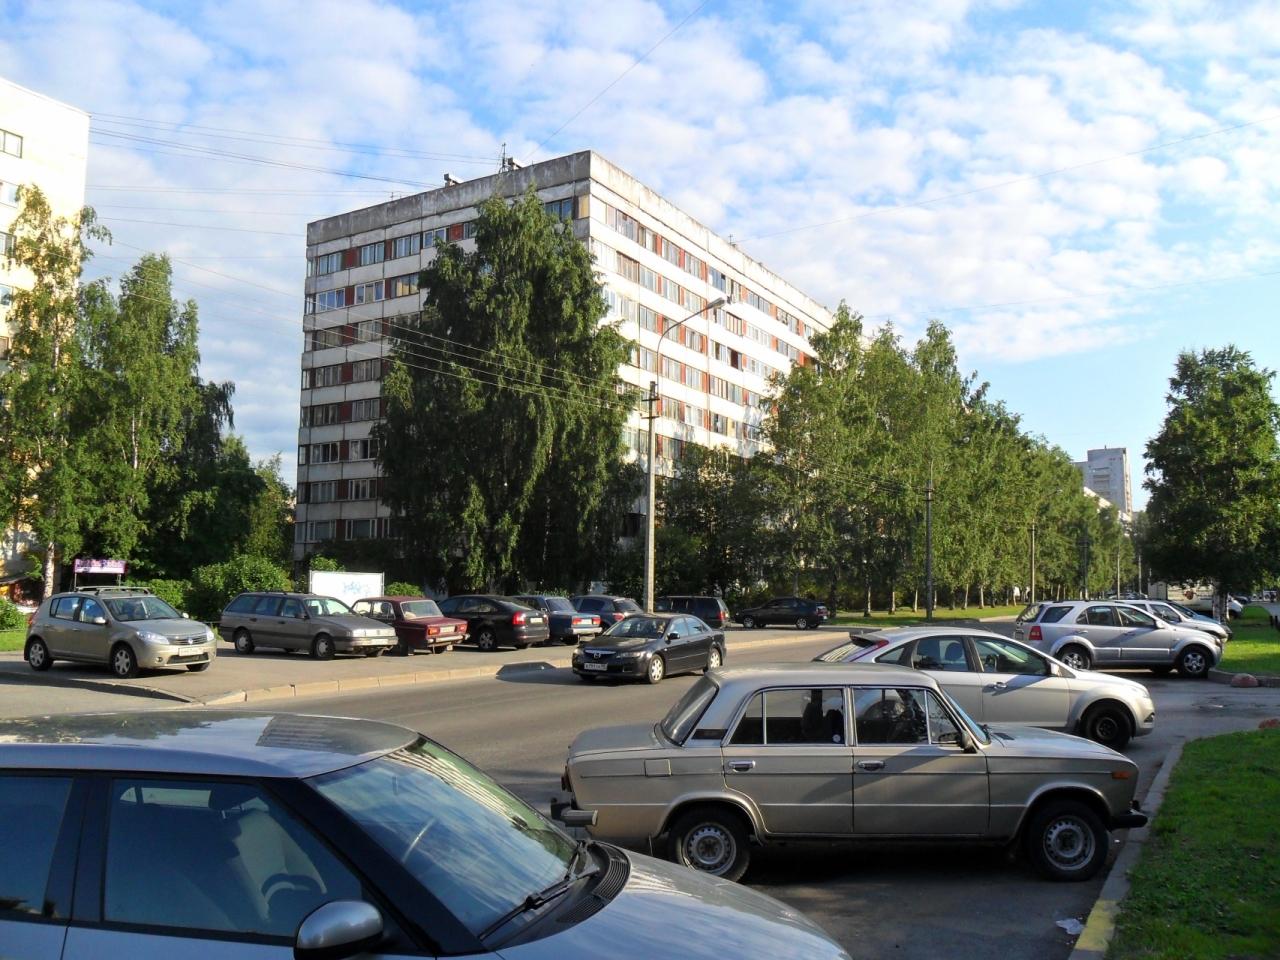 http://arendaspb24.pro.bkn.ru/images/r_big/9e0f753f-78f1-11e7-9c02-448a5bd44c07.jpg